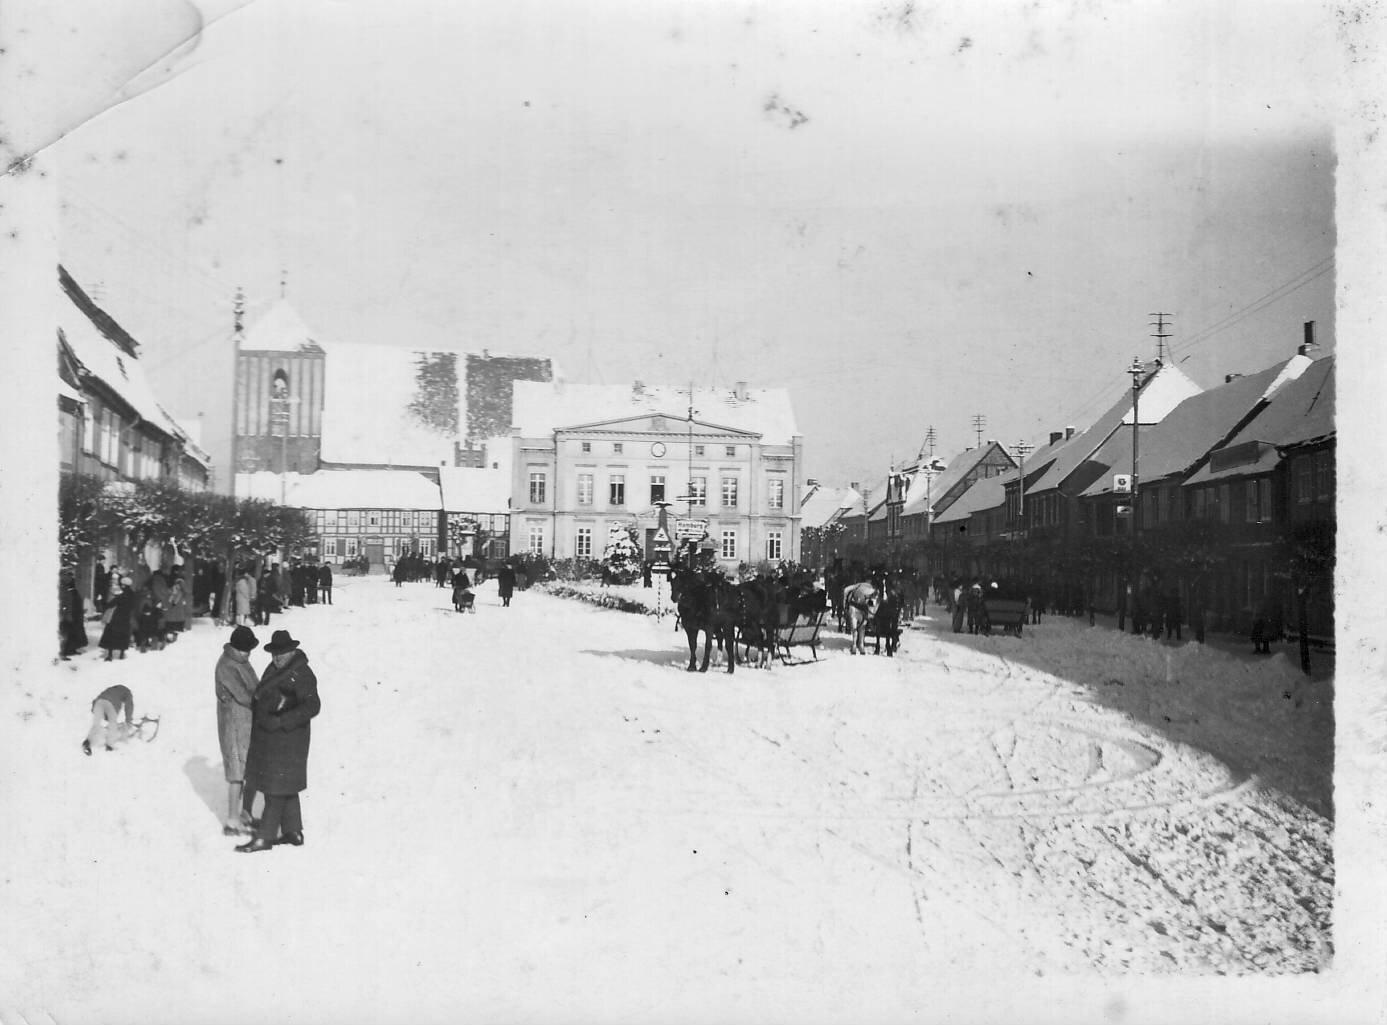 Winter 1928 Foto: Archiv Wegemuseum